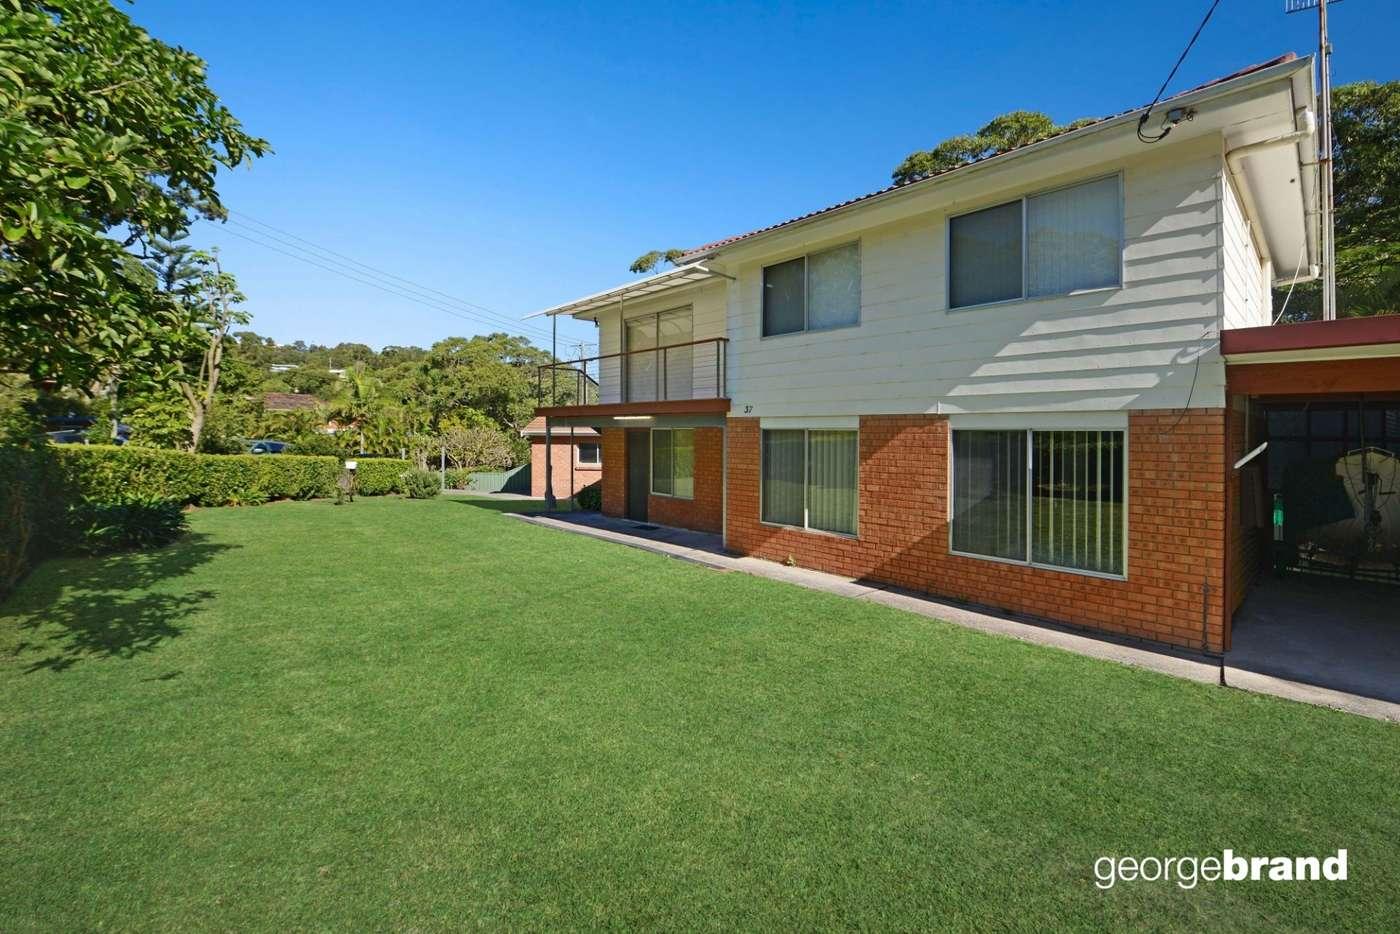 Main view of Homely unit listing, 37 Segura St, Copacabana, NSW 2251